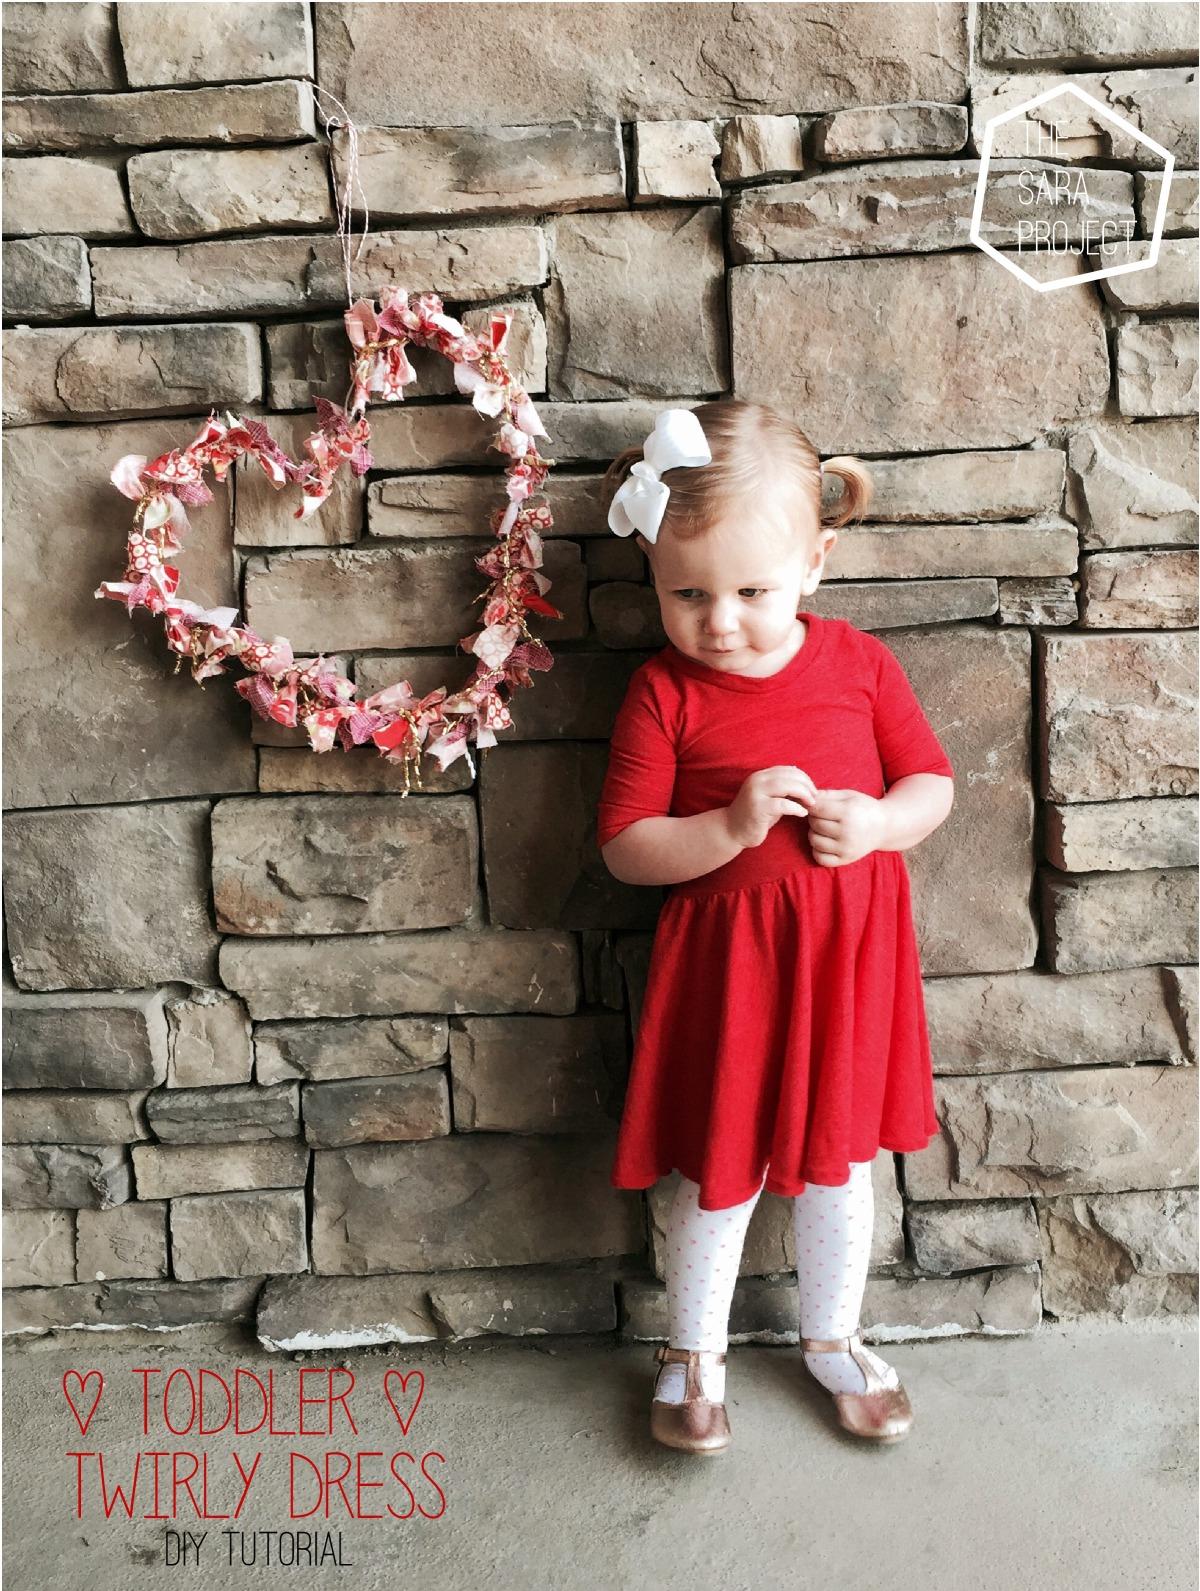 toddlertwirlydress-page-0